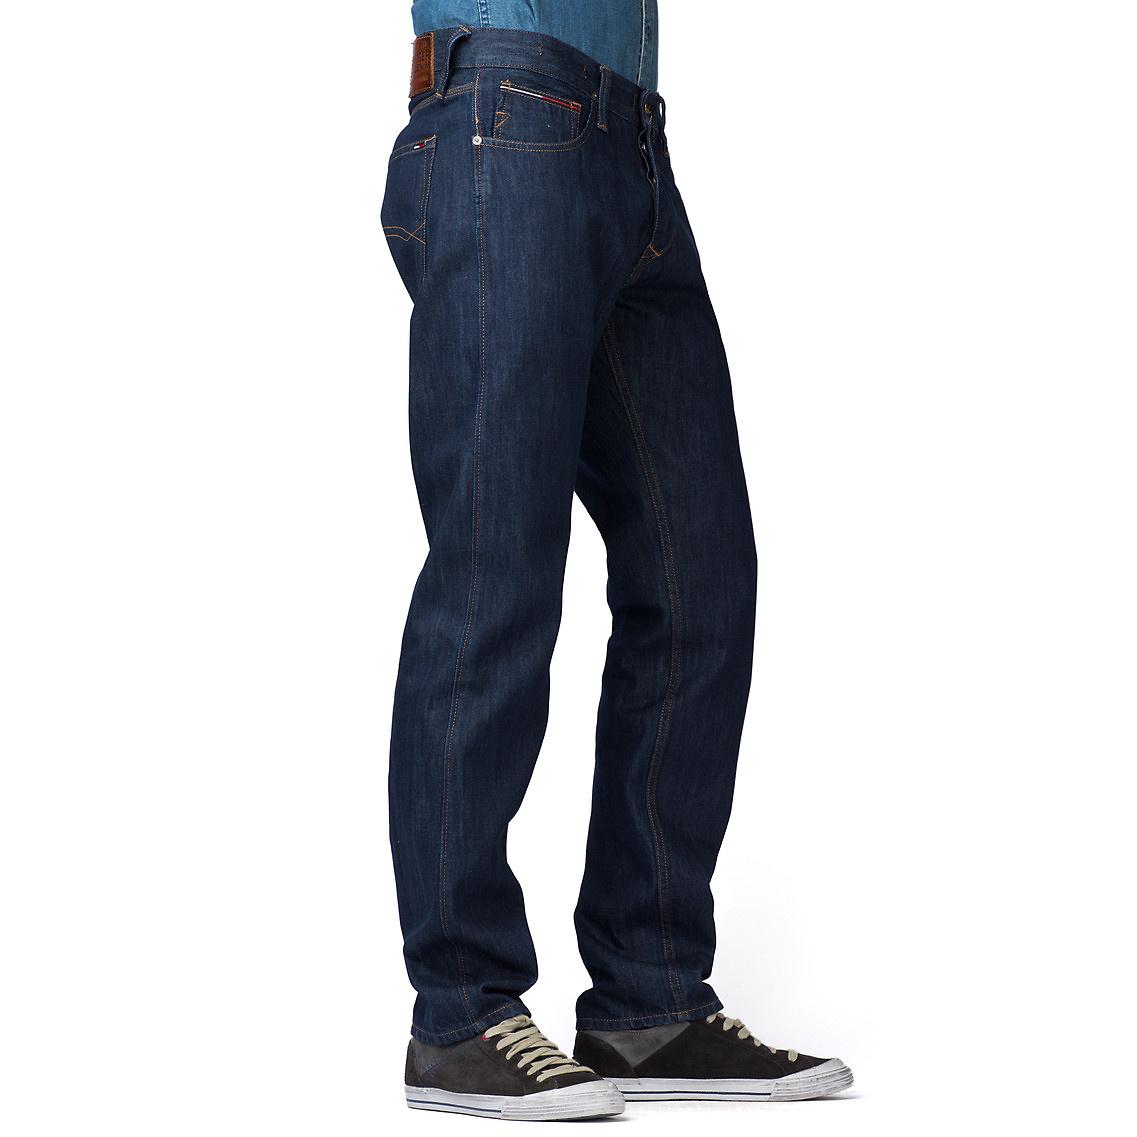 tommy hilfiger ronan straight leg jeans in blue for men lyst. Black Bedroom Furniture Sets. Home Design Ideas